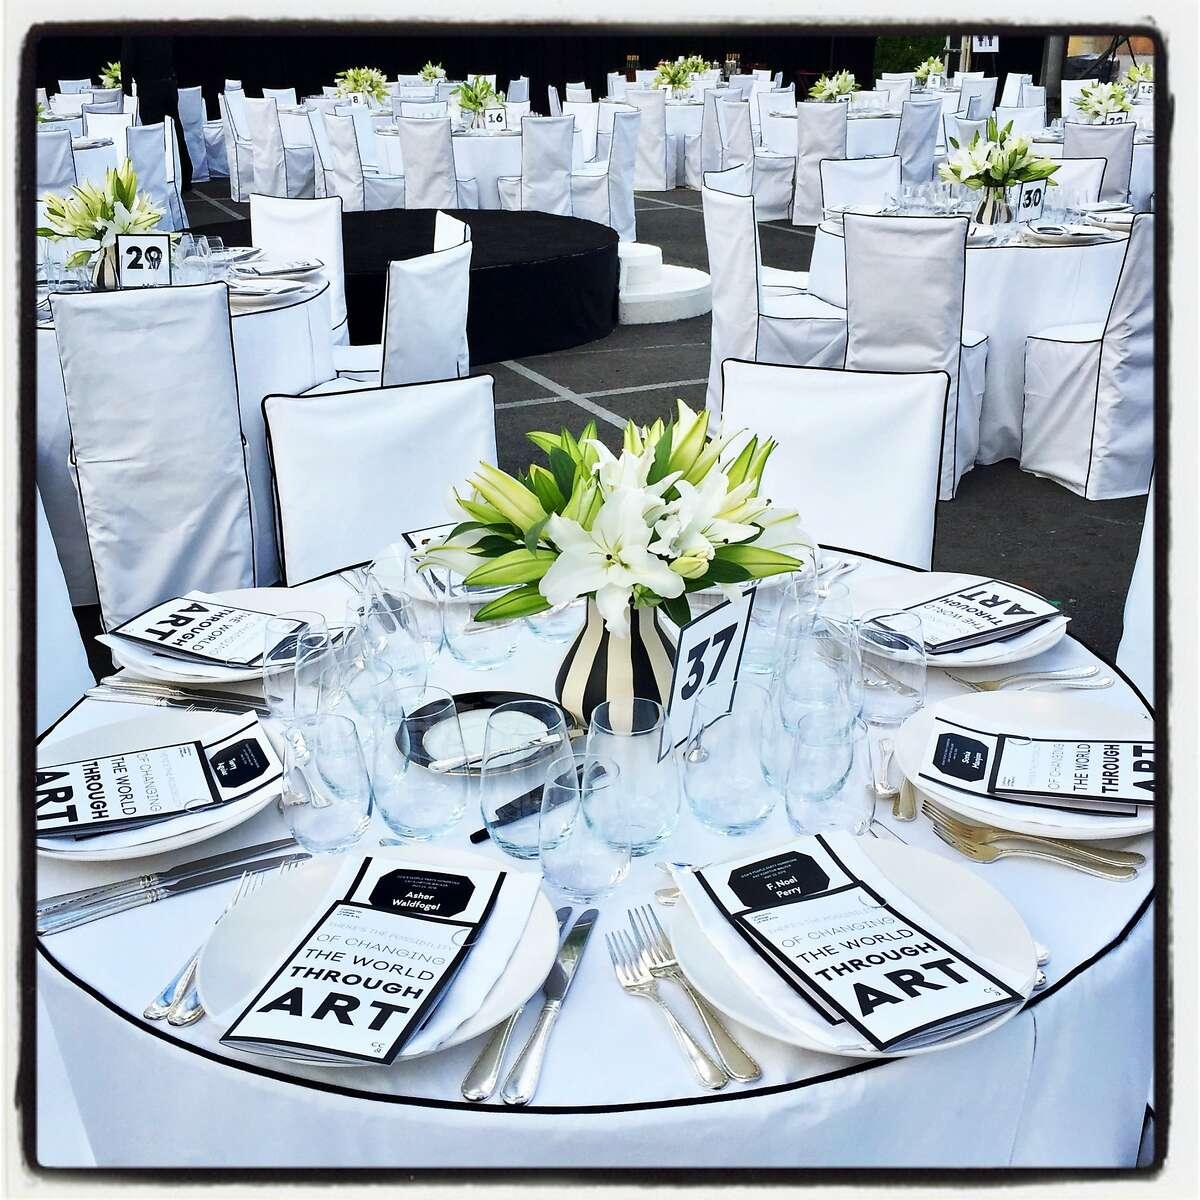 Stanlee Gatti design at the CCA gala echoed the elegance of honoree Kay Kimpton Walker. May 23, 2018.